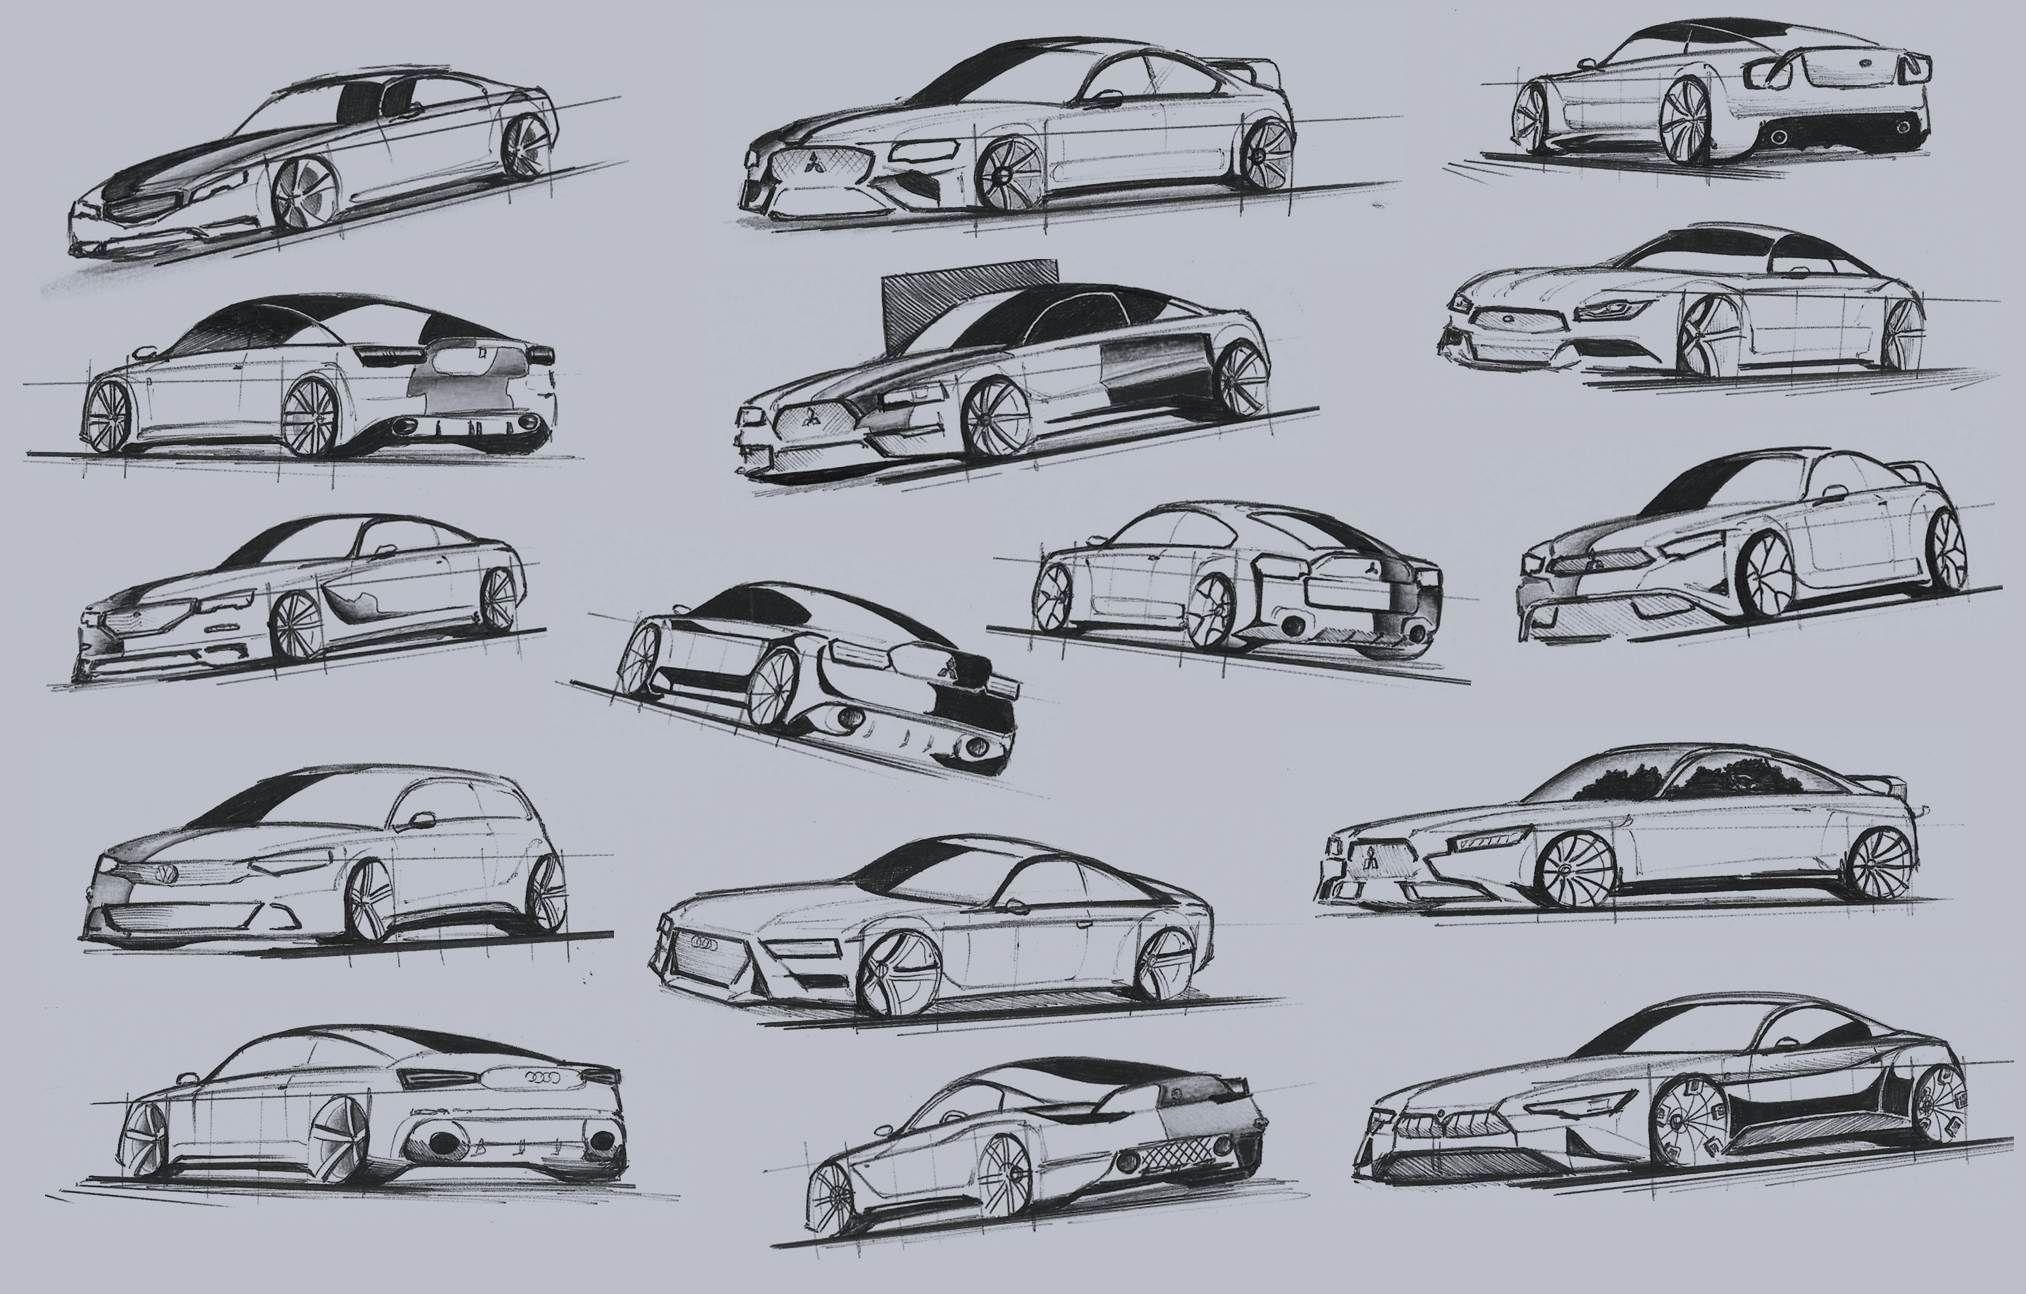 Sketch. Cars. Mitsubishi Lancer. Audi. BMW. Golf. Ford. Peugeot. Design 2016. Various cars. Car design